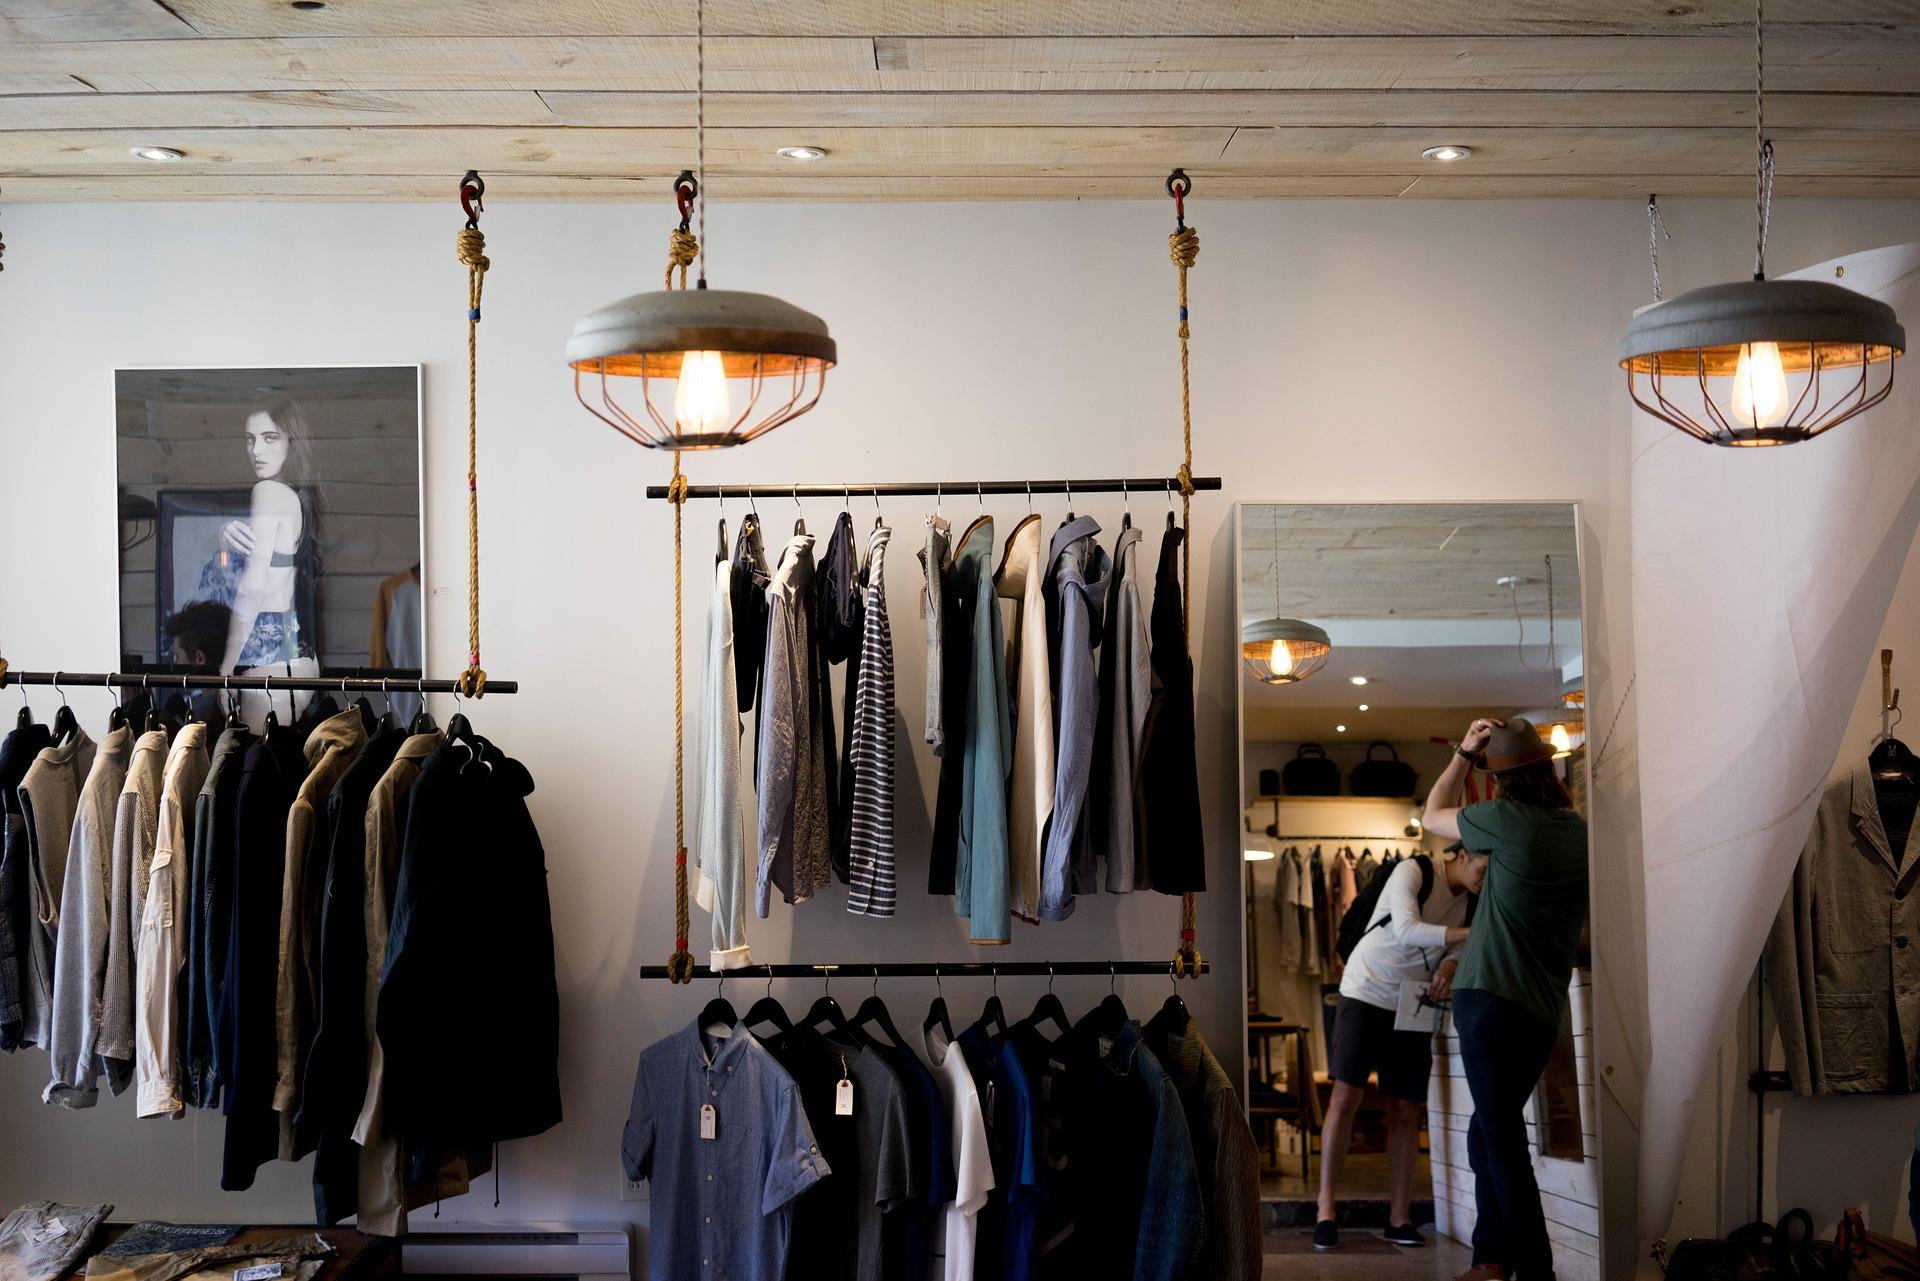 An independent fashion retailer